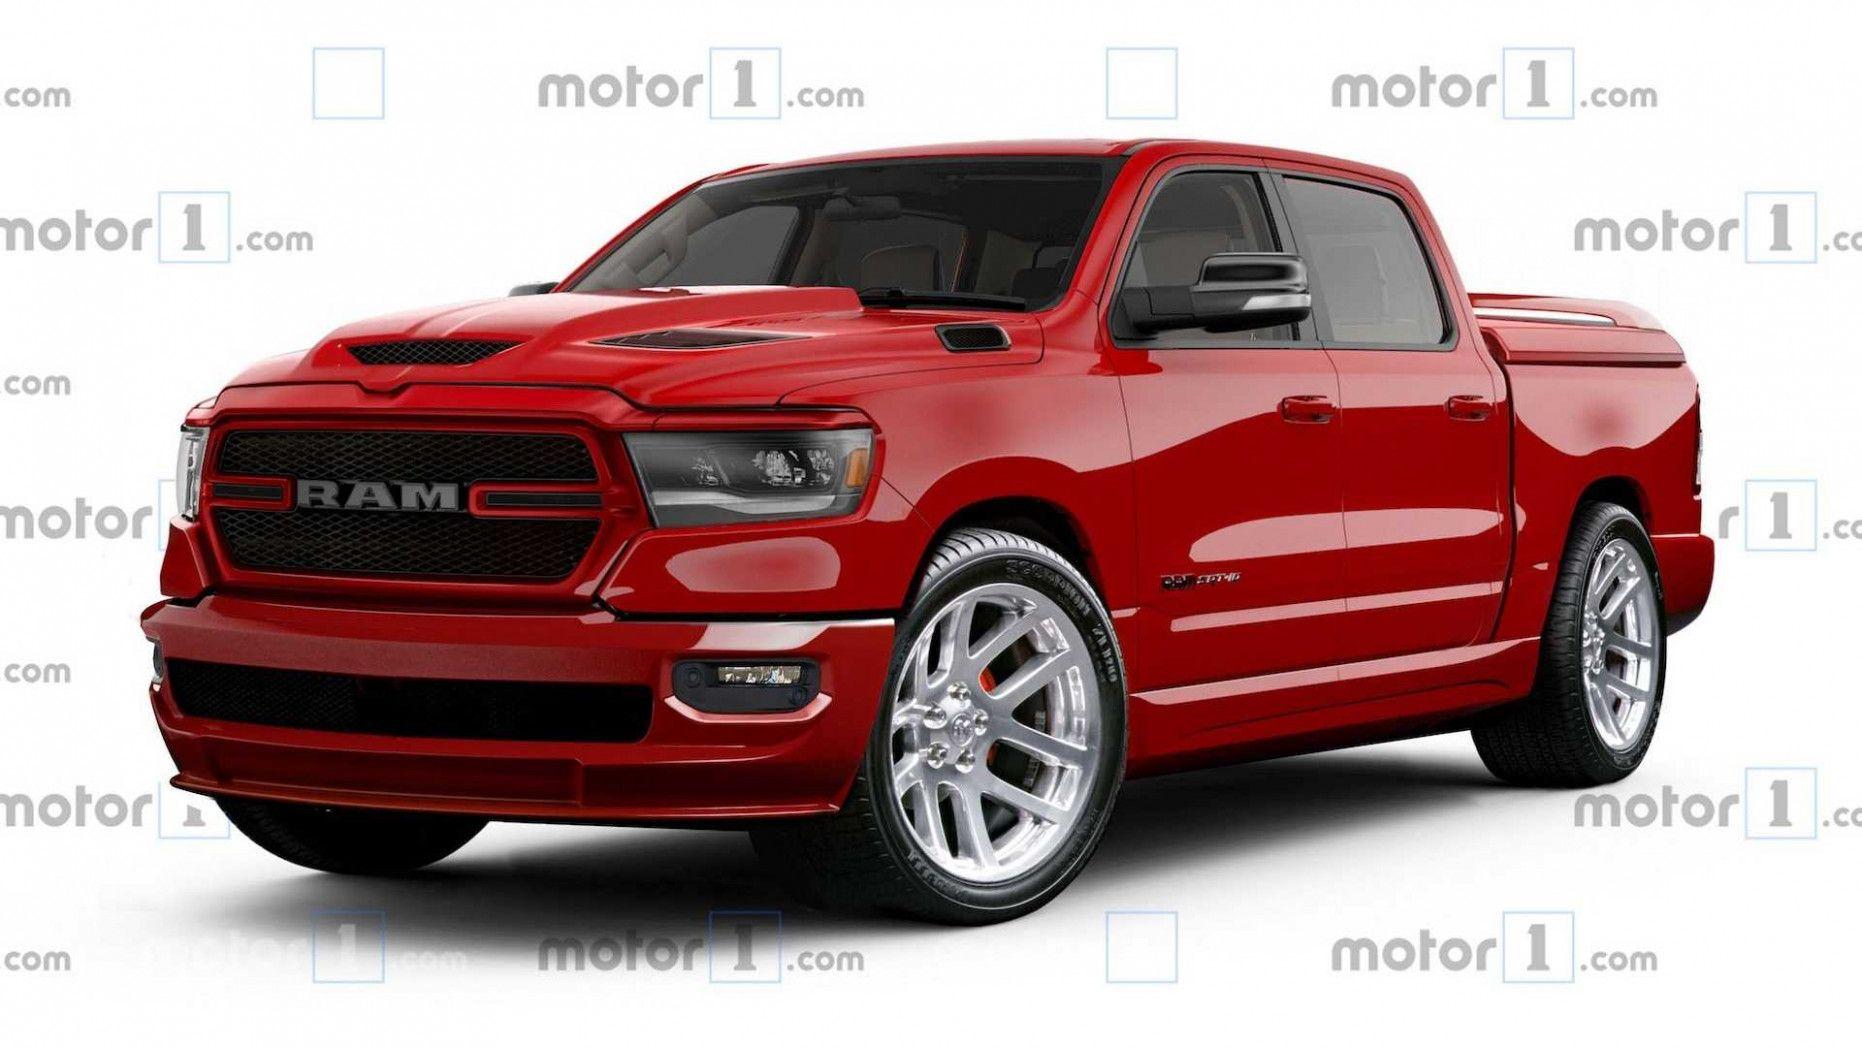 2020 Dodge Ram Srt 10 In 2020 Dodge Trucks Ram Dodge Ram Srt 10 Dodge Ram 1500